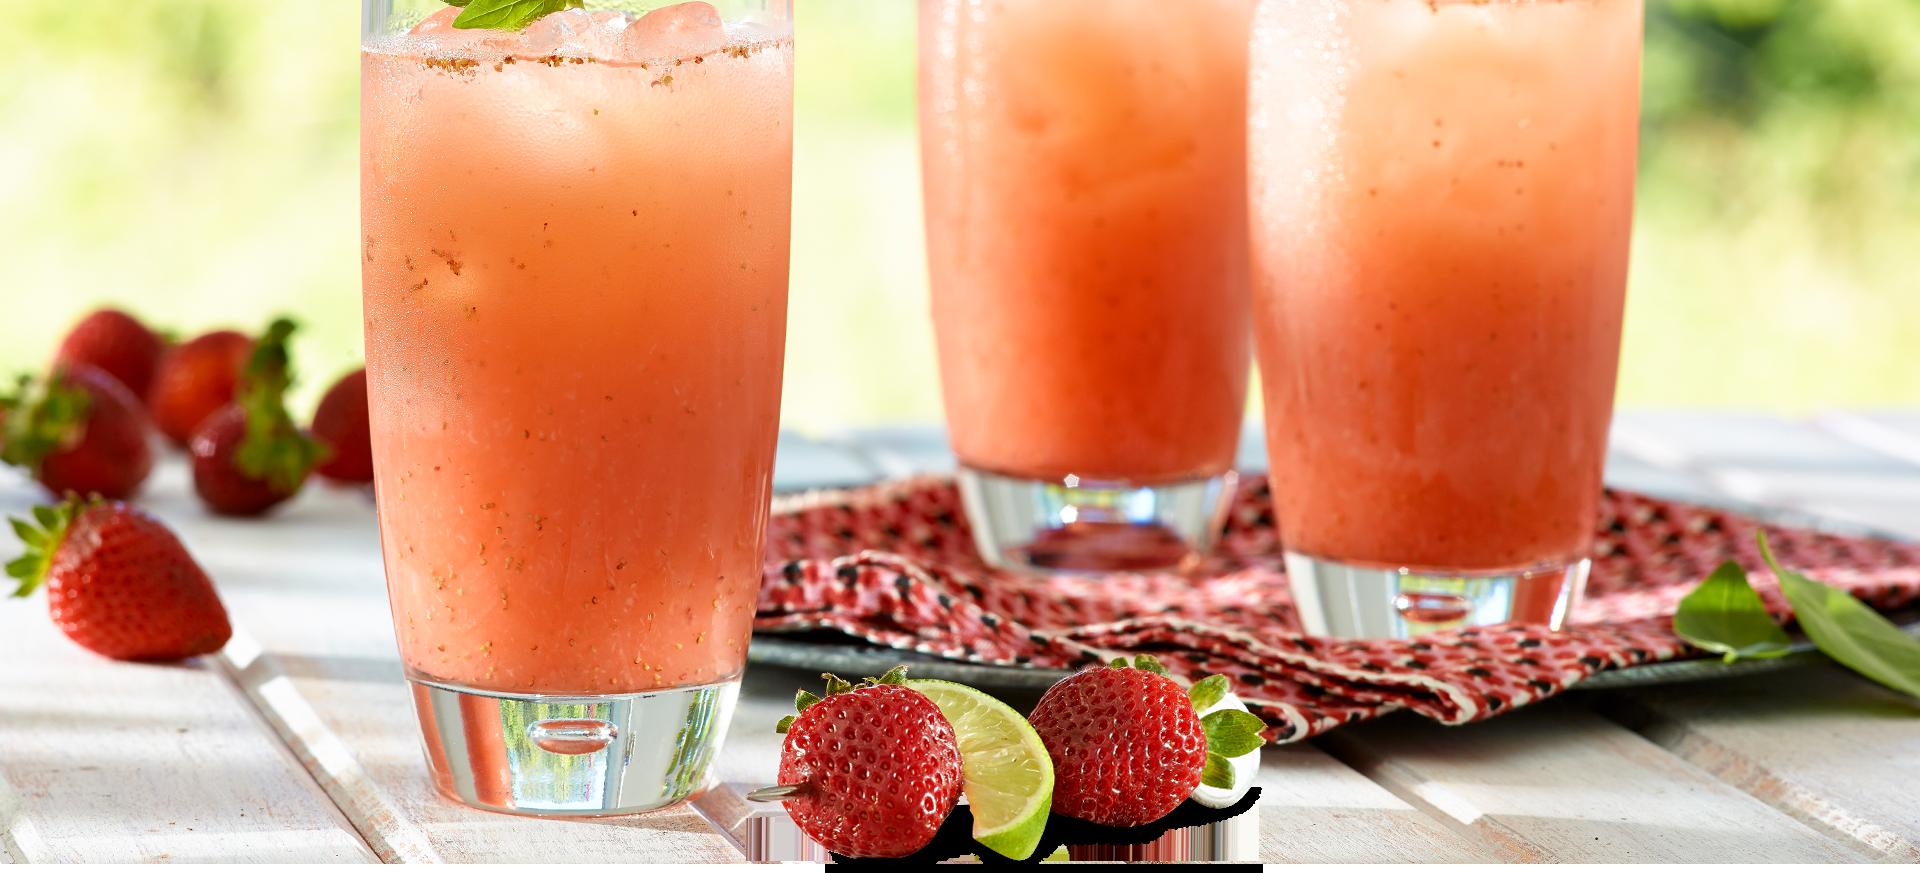 Strawberry Basil Limeade header BG Larger File Quality